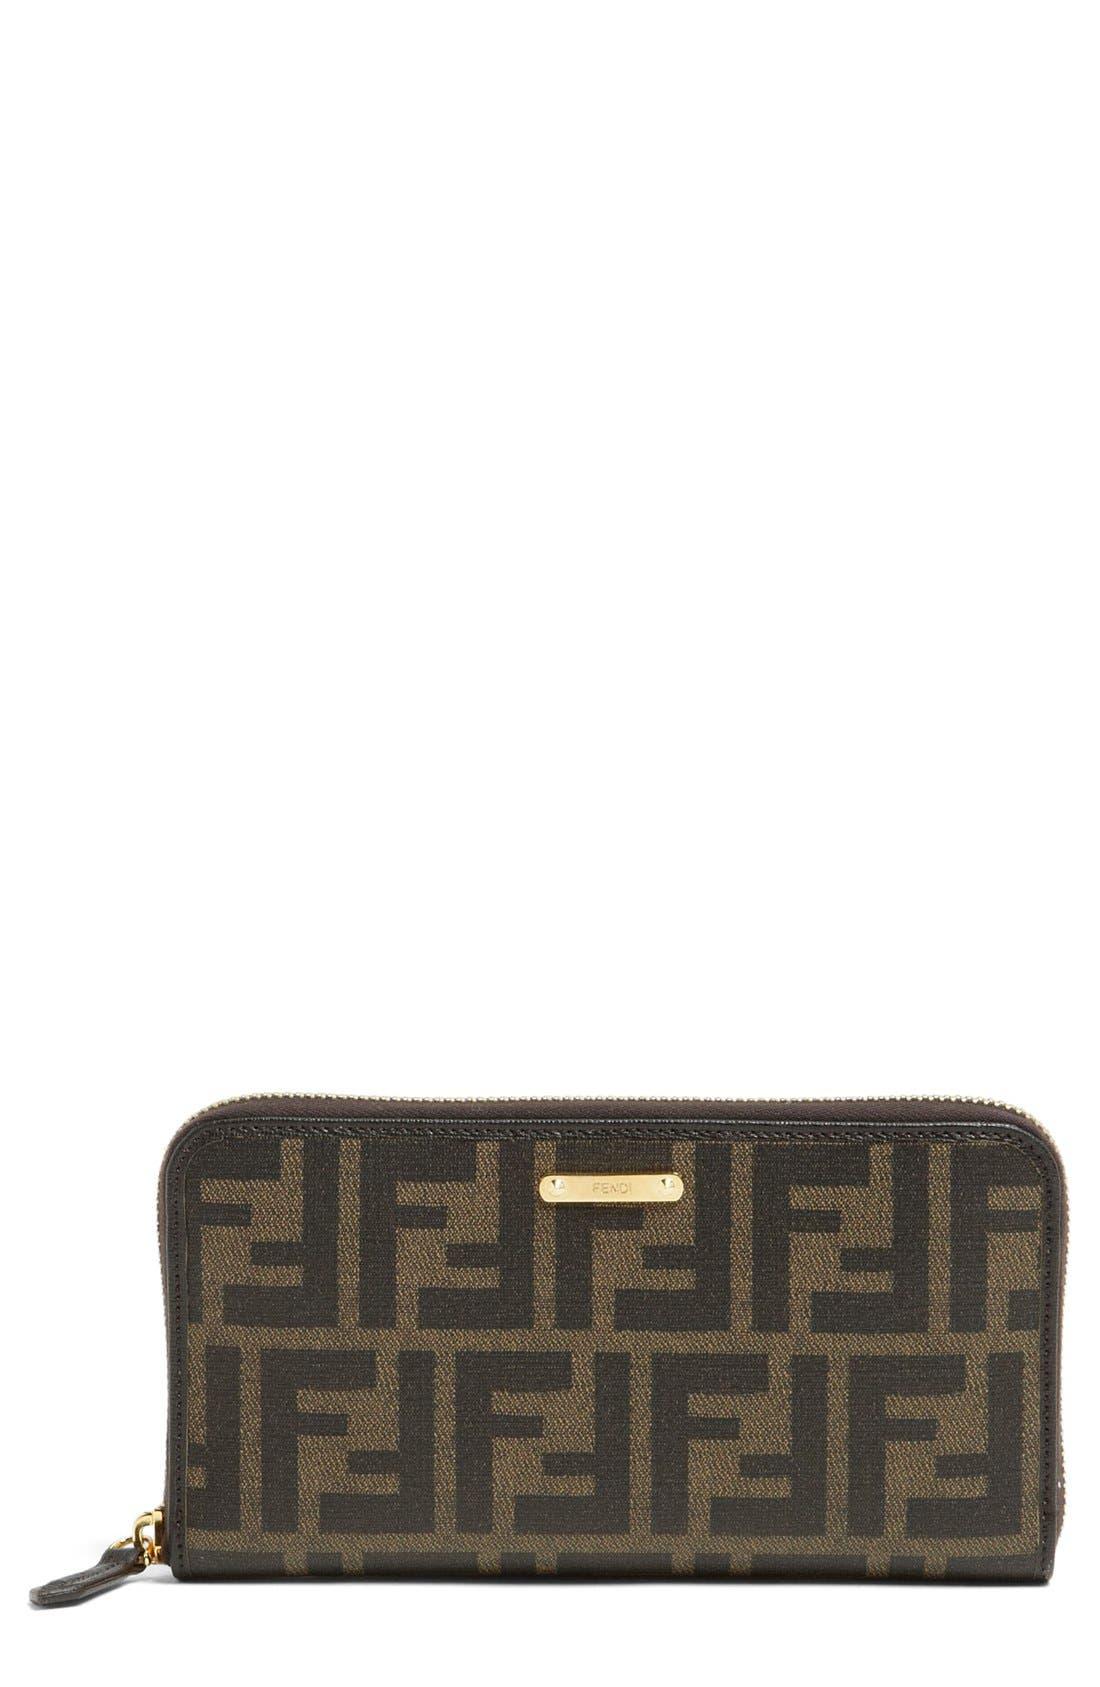 Alternate Image 1 Selected - Fendi 'Zucca' Wallet